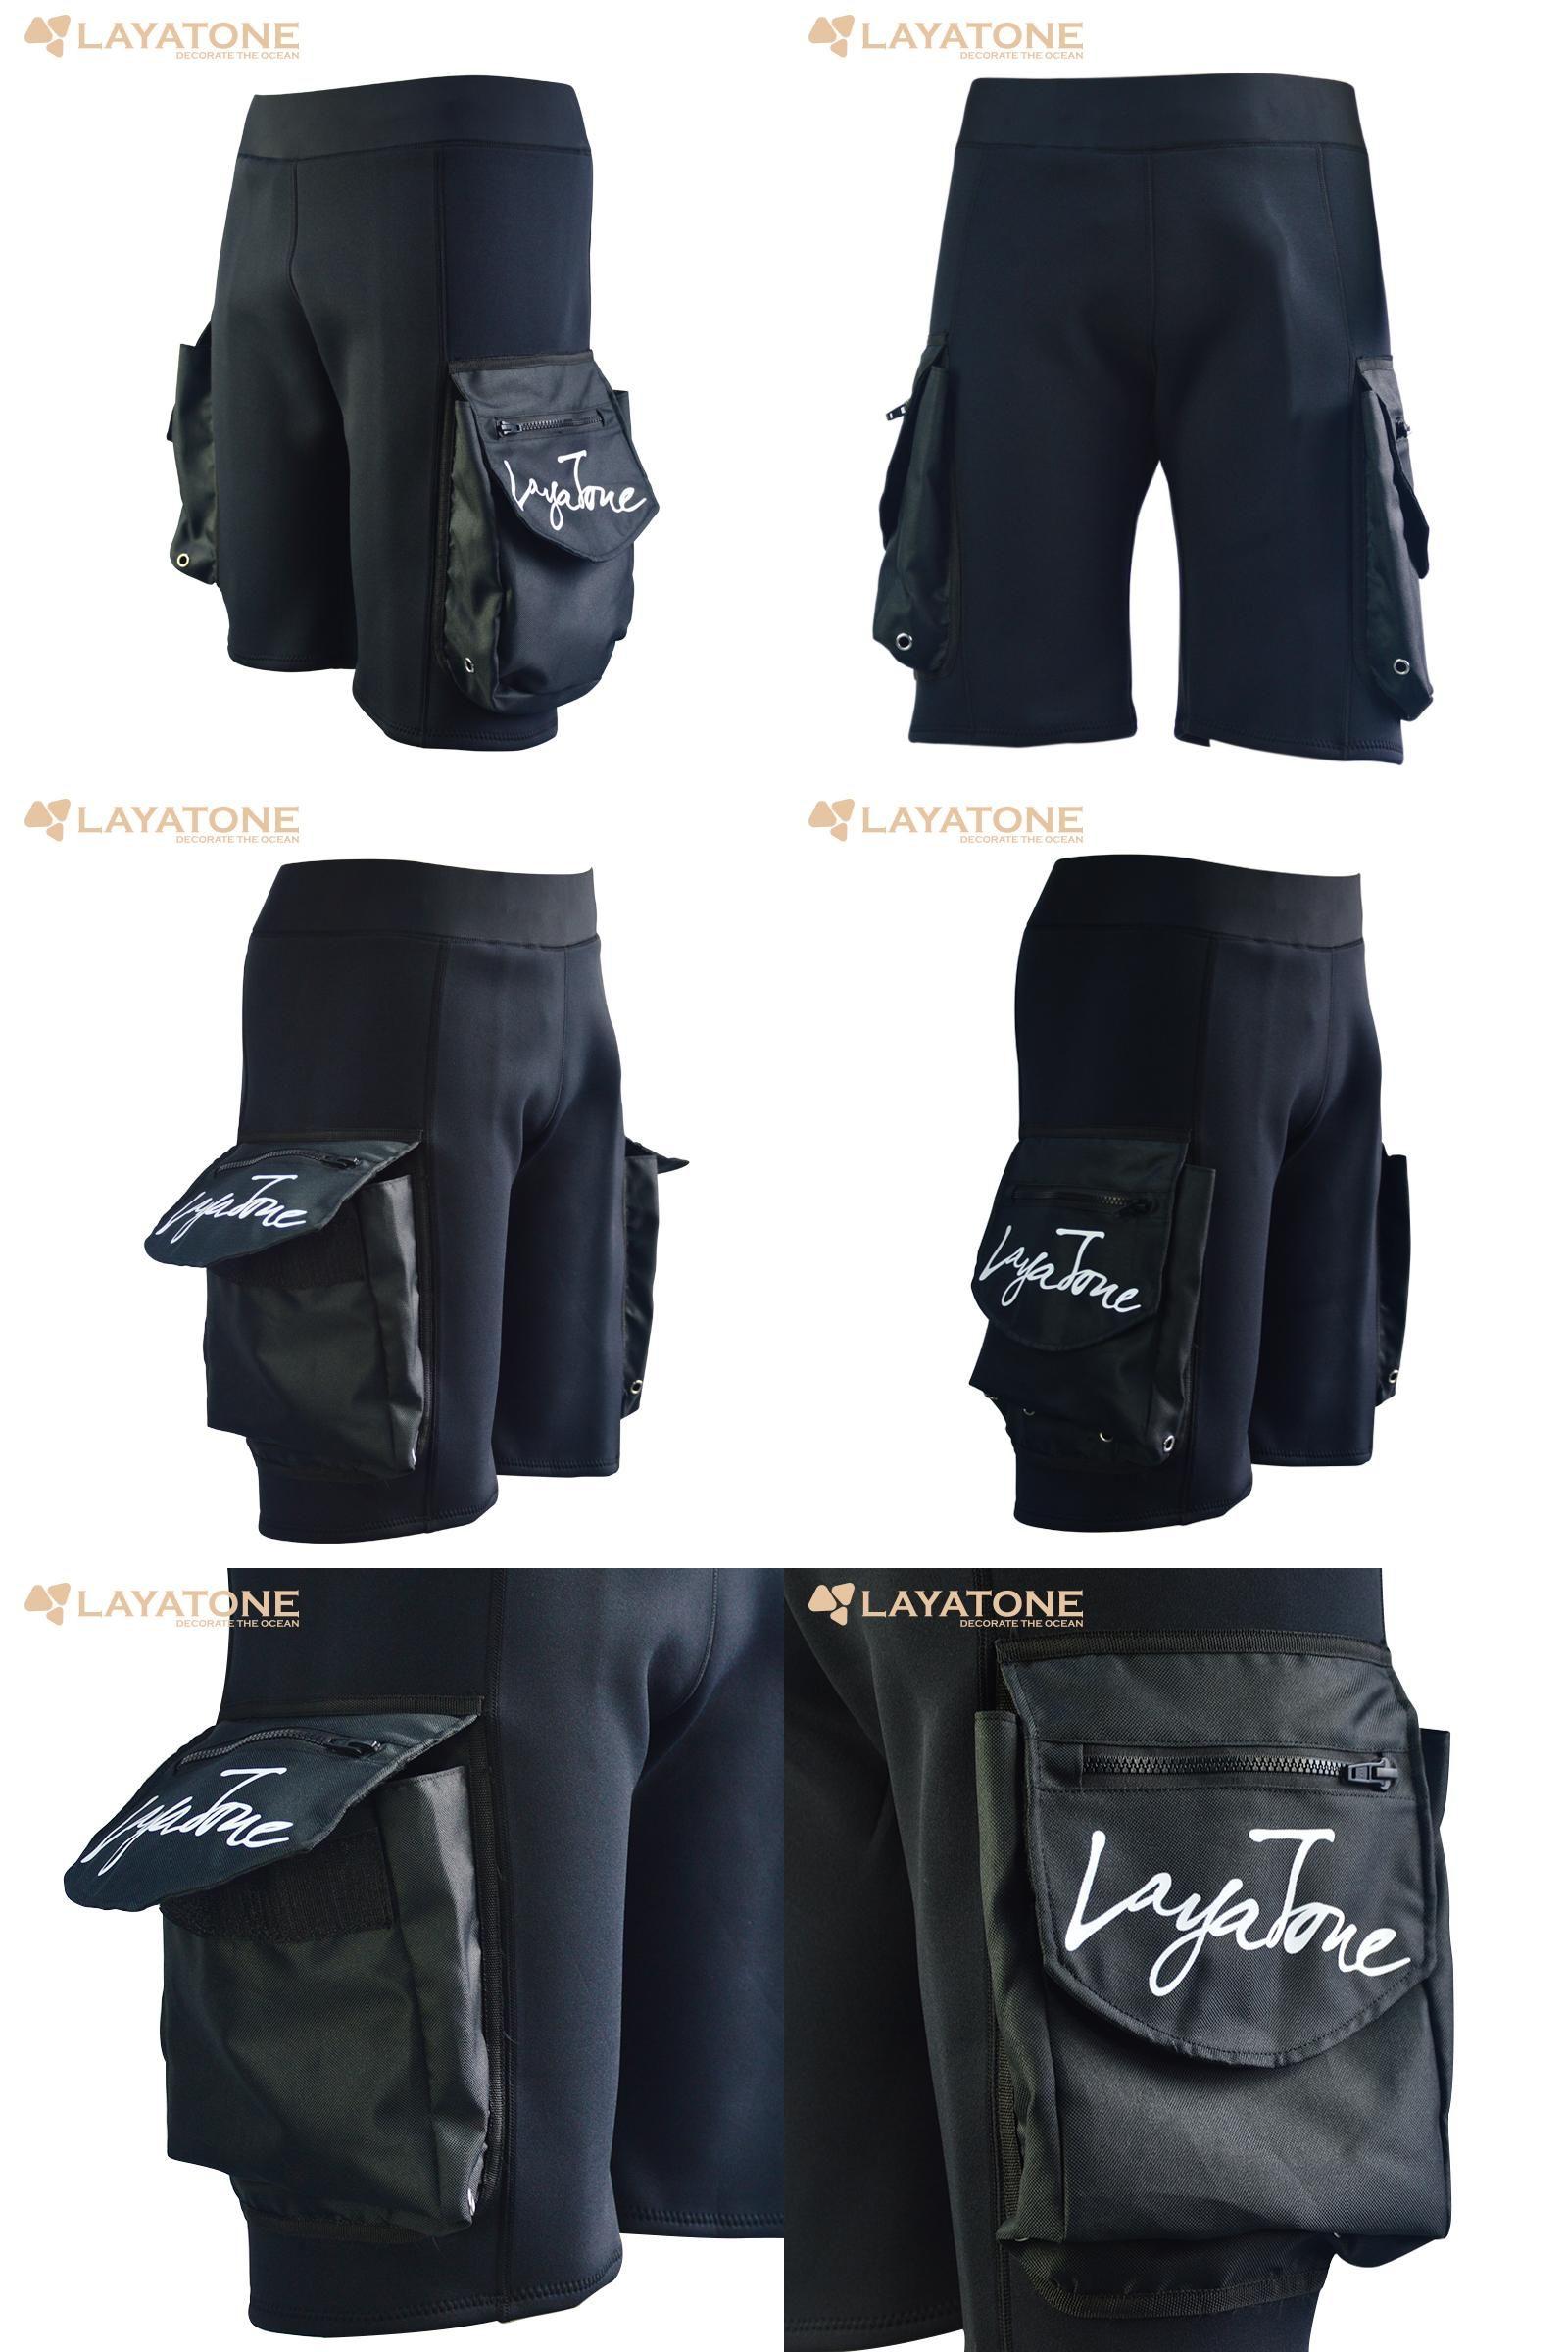 be1fe4b09c5  Visit to Buy  Freeshipping Layatone Black 3mm Neoprene Shorts Snorkel Diving  Surfing Fishing Pants